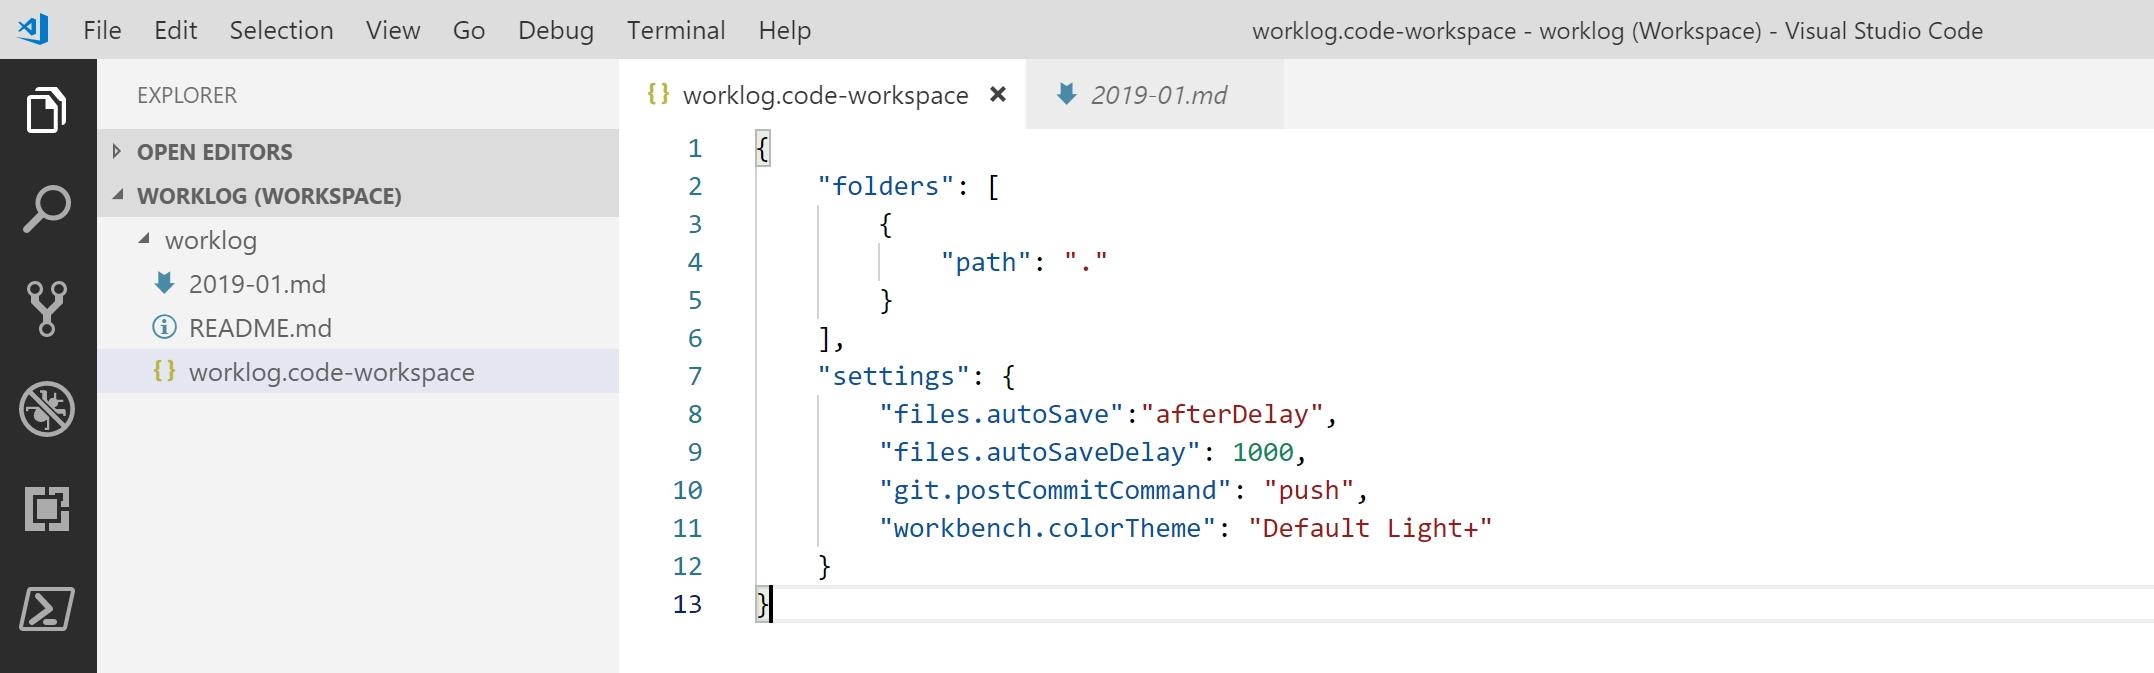 2019-01-12 11_04_00-worklog.code-workspace - worklog (Workspace) - Visual Studio Code.jpg